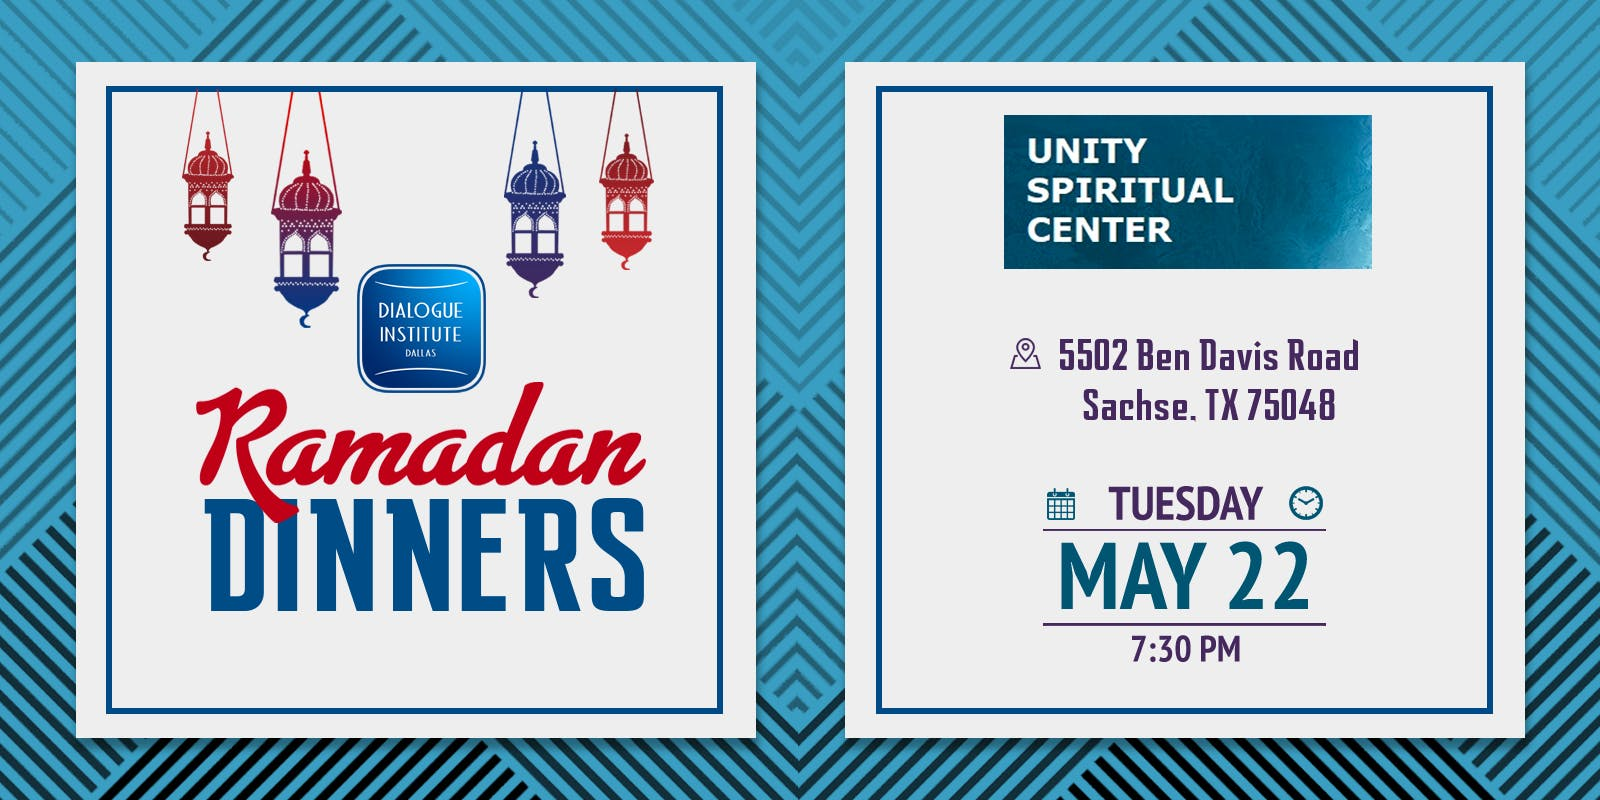 Ramadan Dinner at Unity Spiritual Center